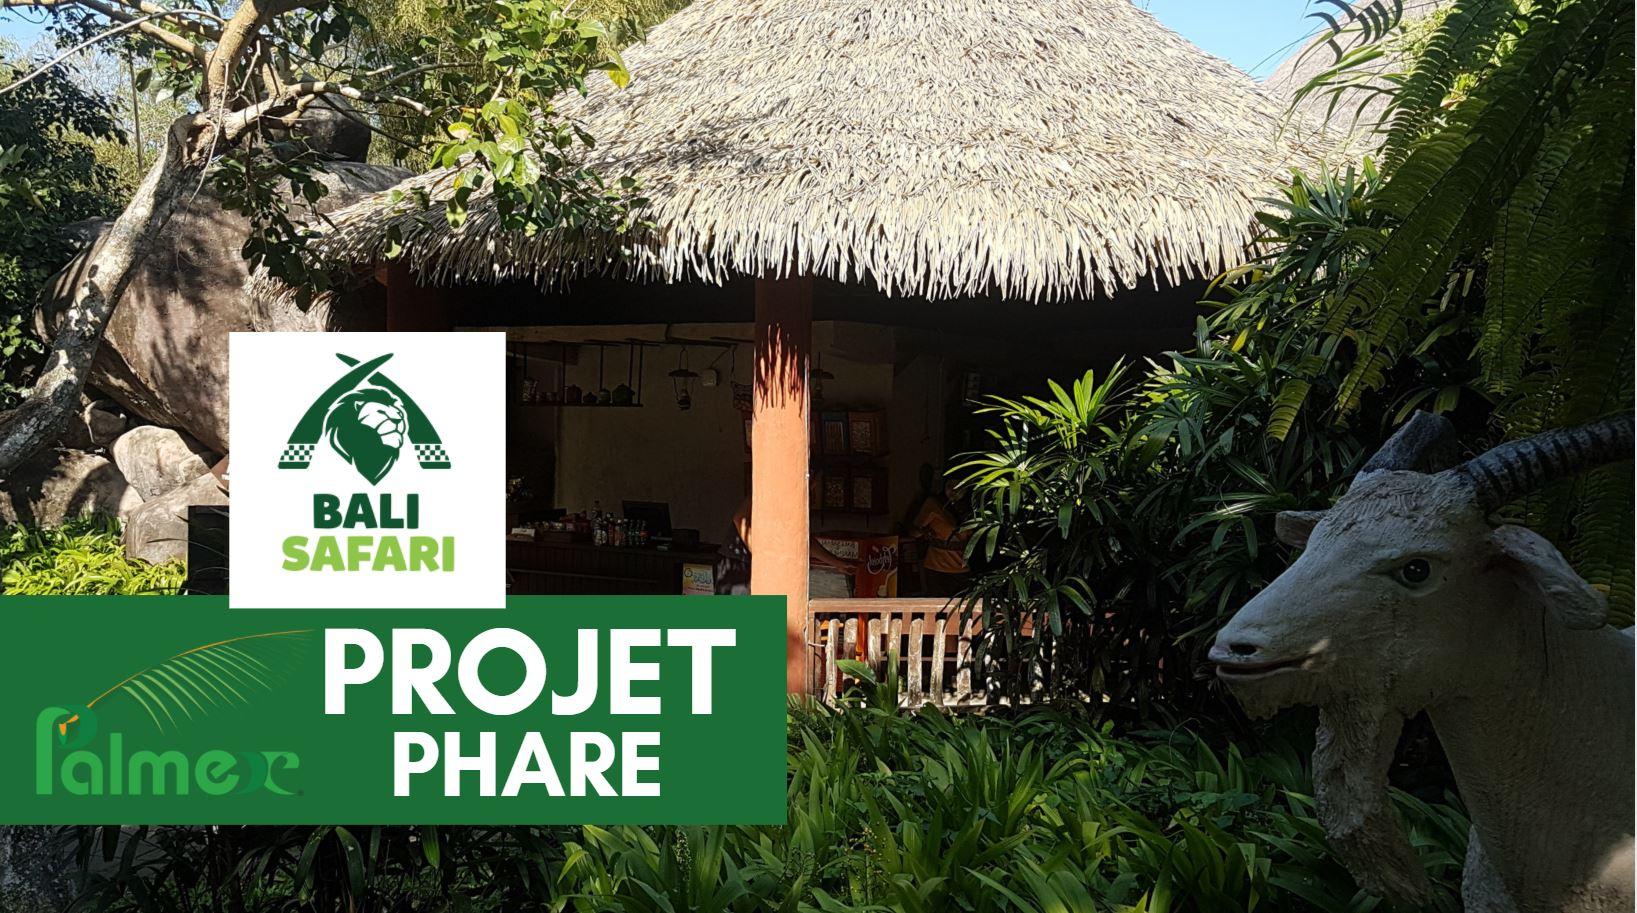 Projet Phare Palmex – Bali Safari